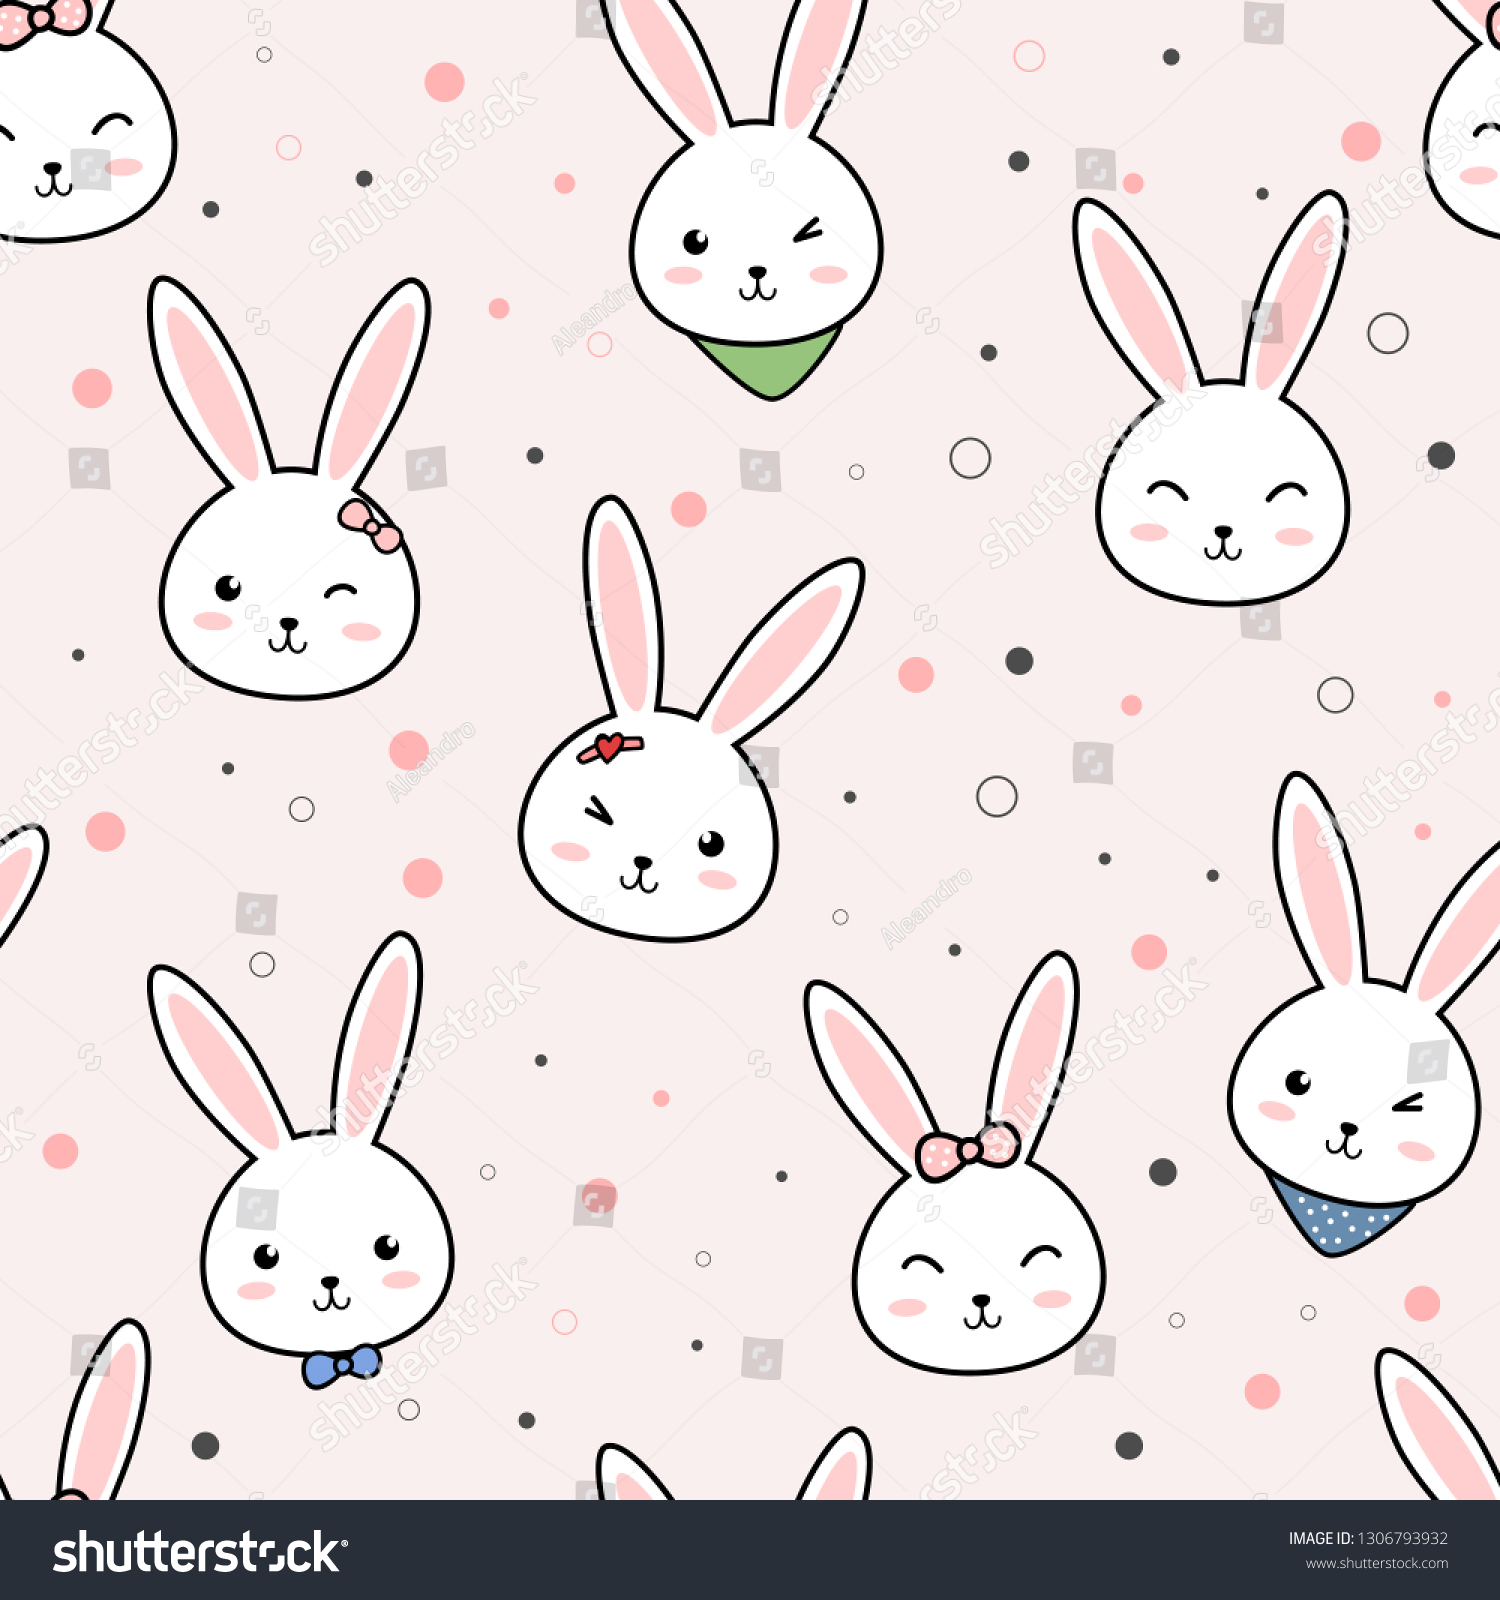 Cute Adorable Kawaii Rabbit Bunny Head Stock Vector Royalty Free